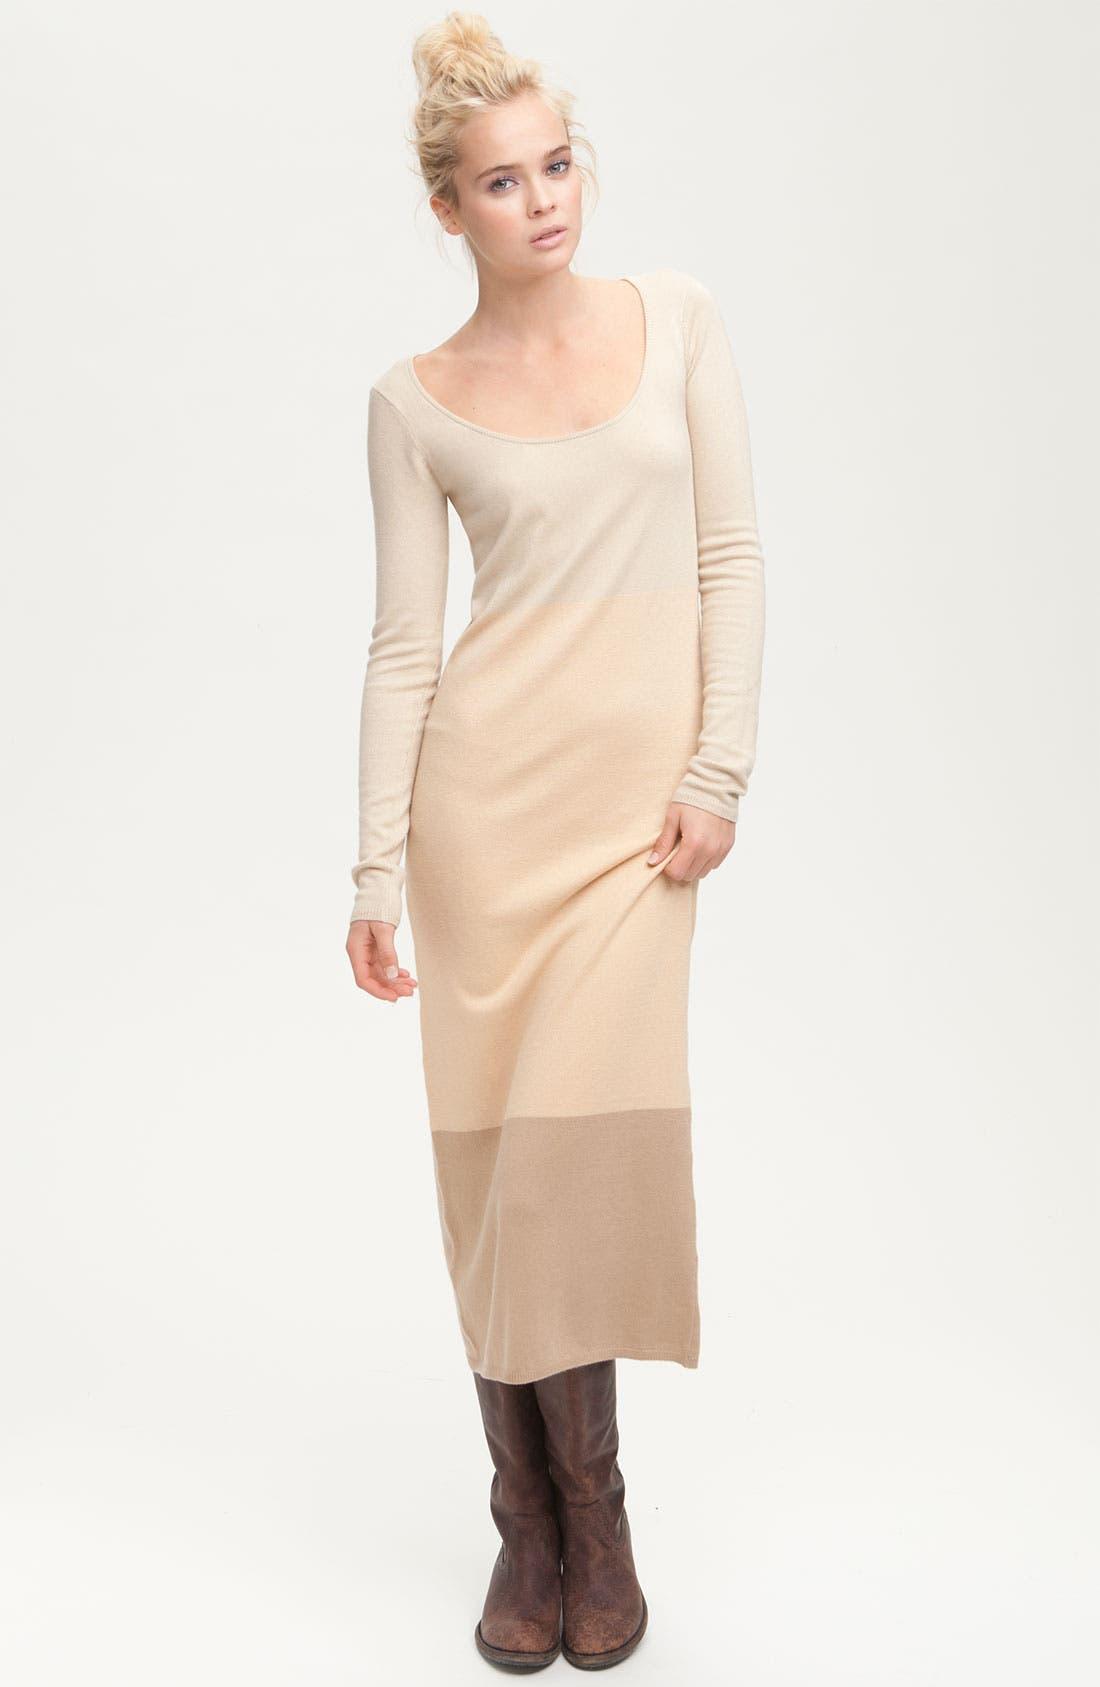 'Clove' Long Sleeve Colorblock Maxi Dress,                         Main,                         color, Cream/ Ginger